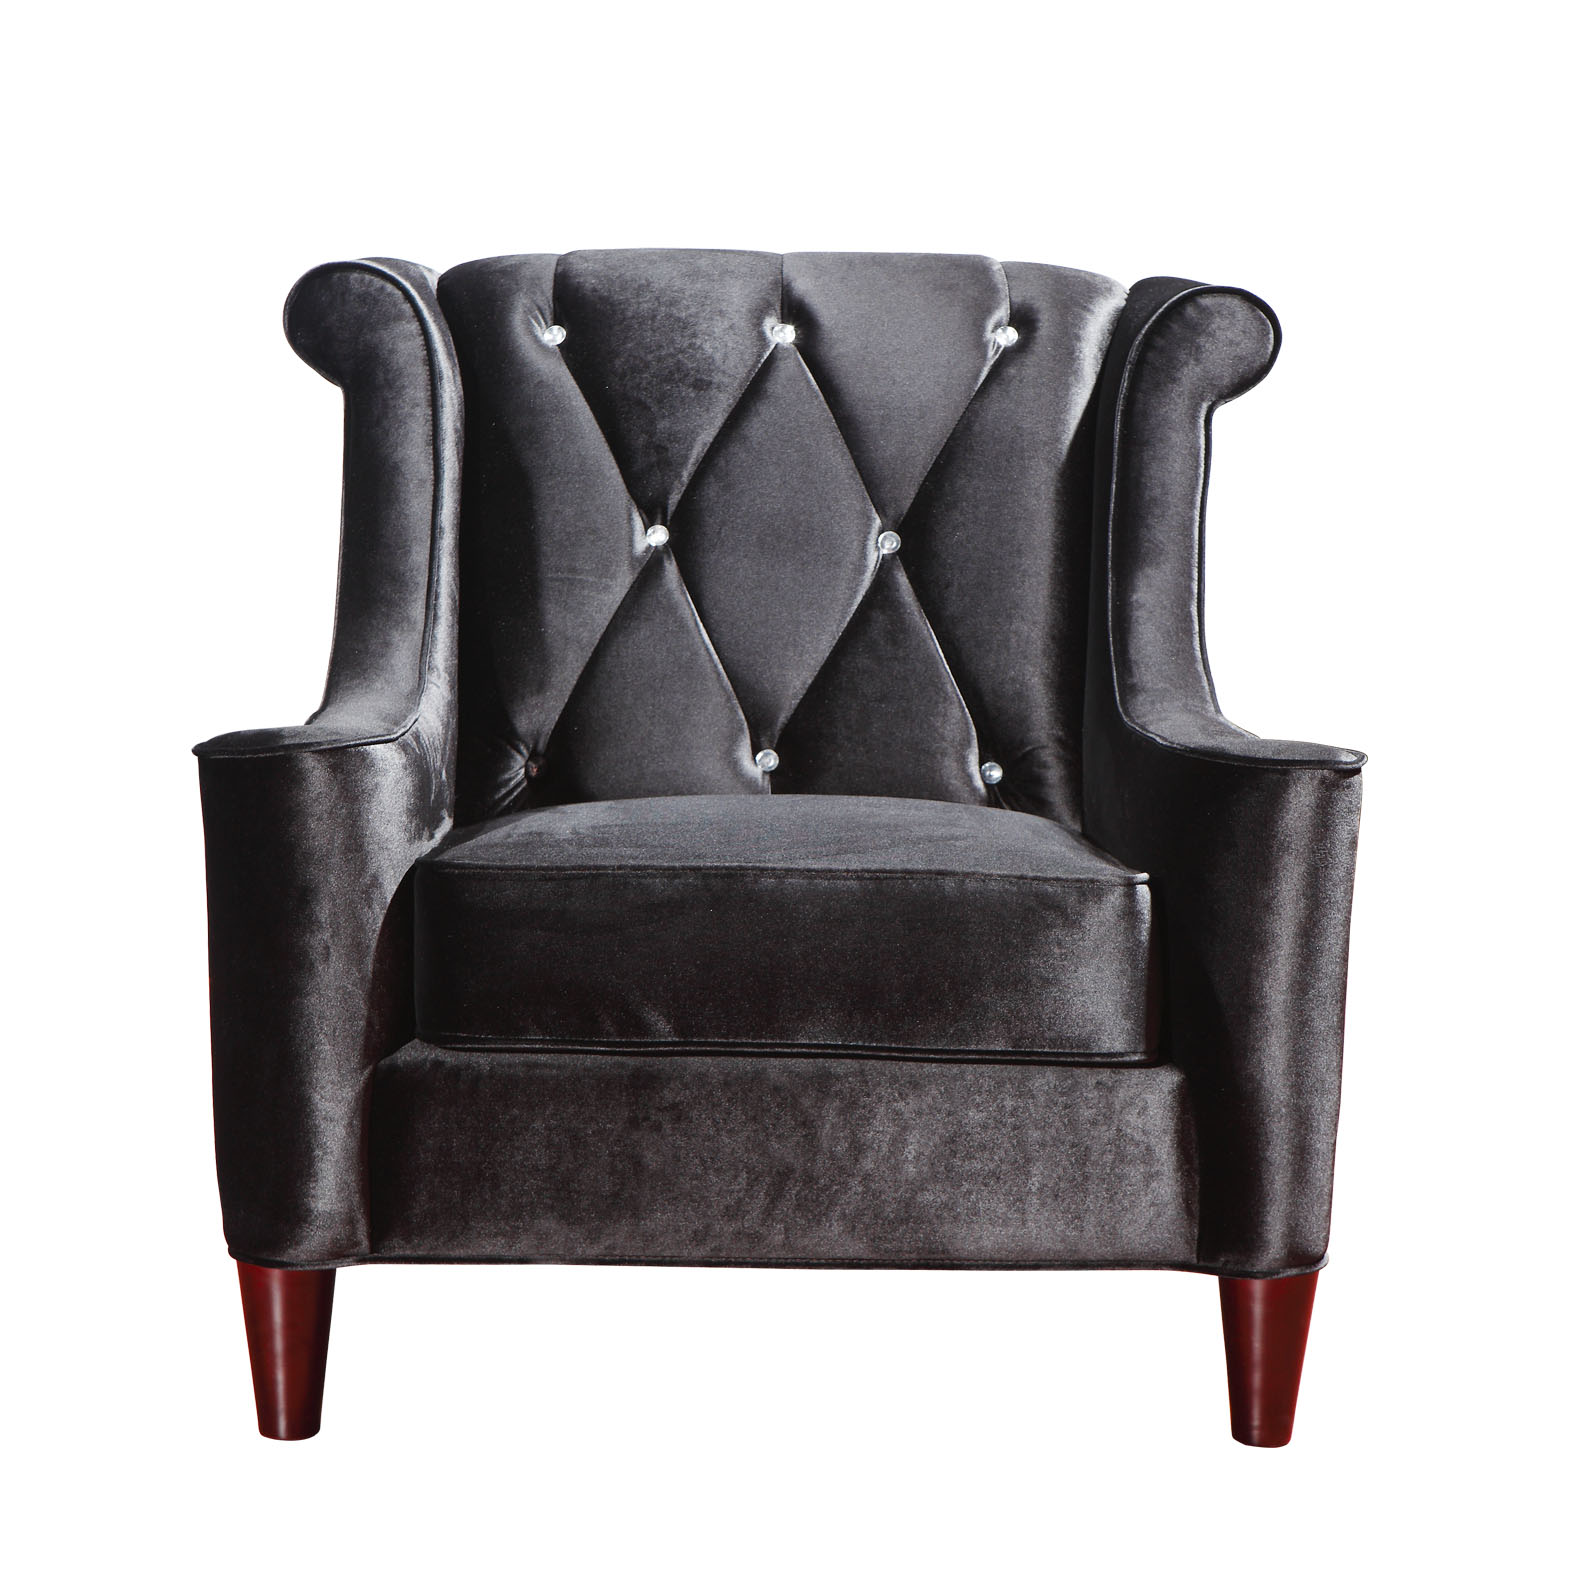 black velvet chair bedroom philippines barrister tufted with rhinestones las vegas